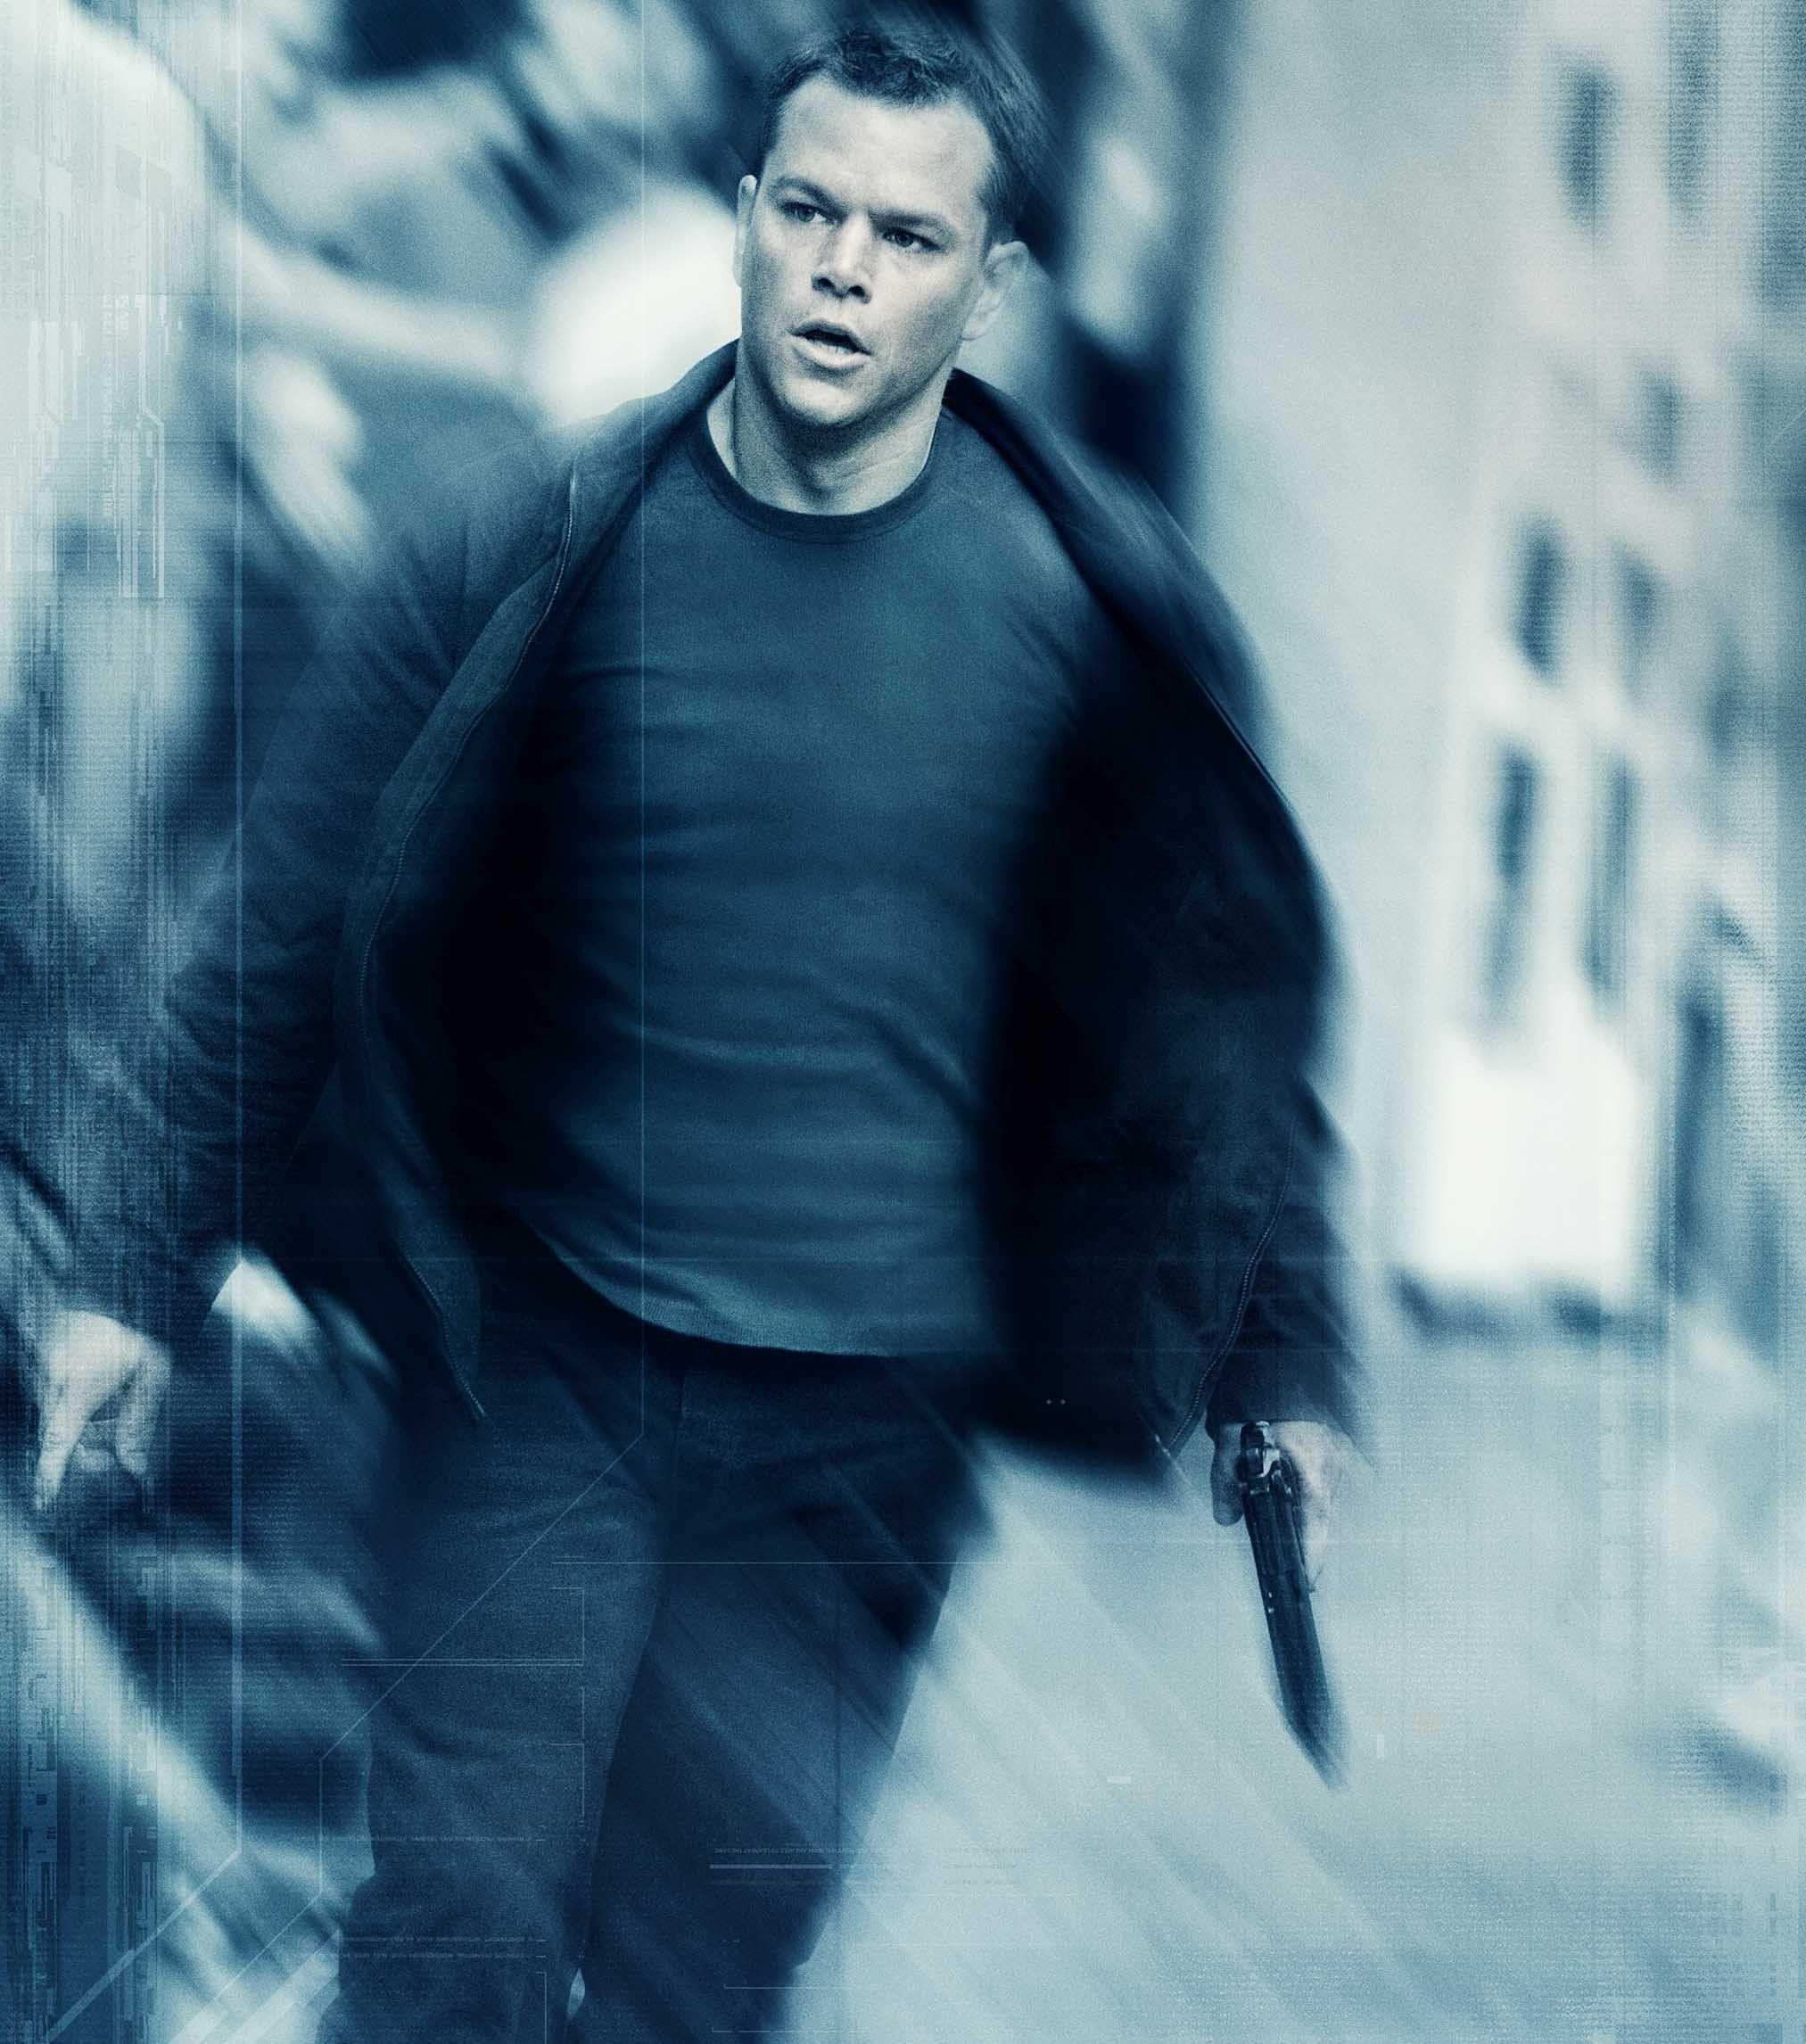 Jason Bourne 6 Release Date Cast Plot Trailer And More